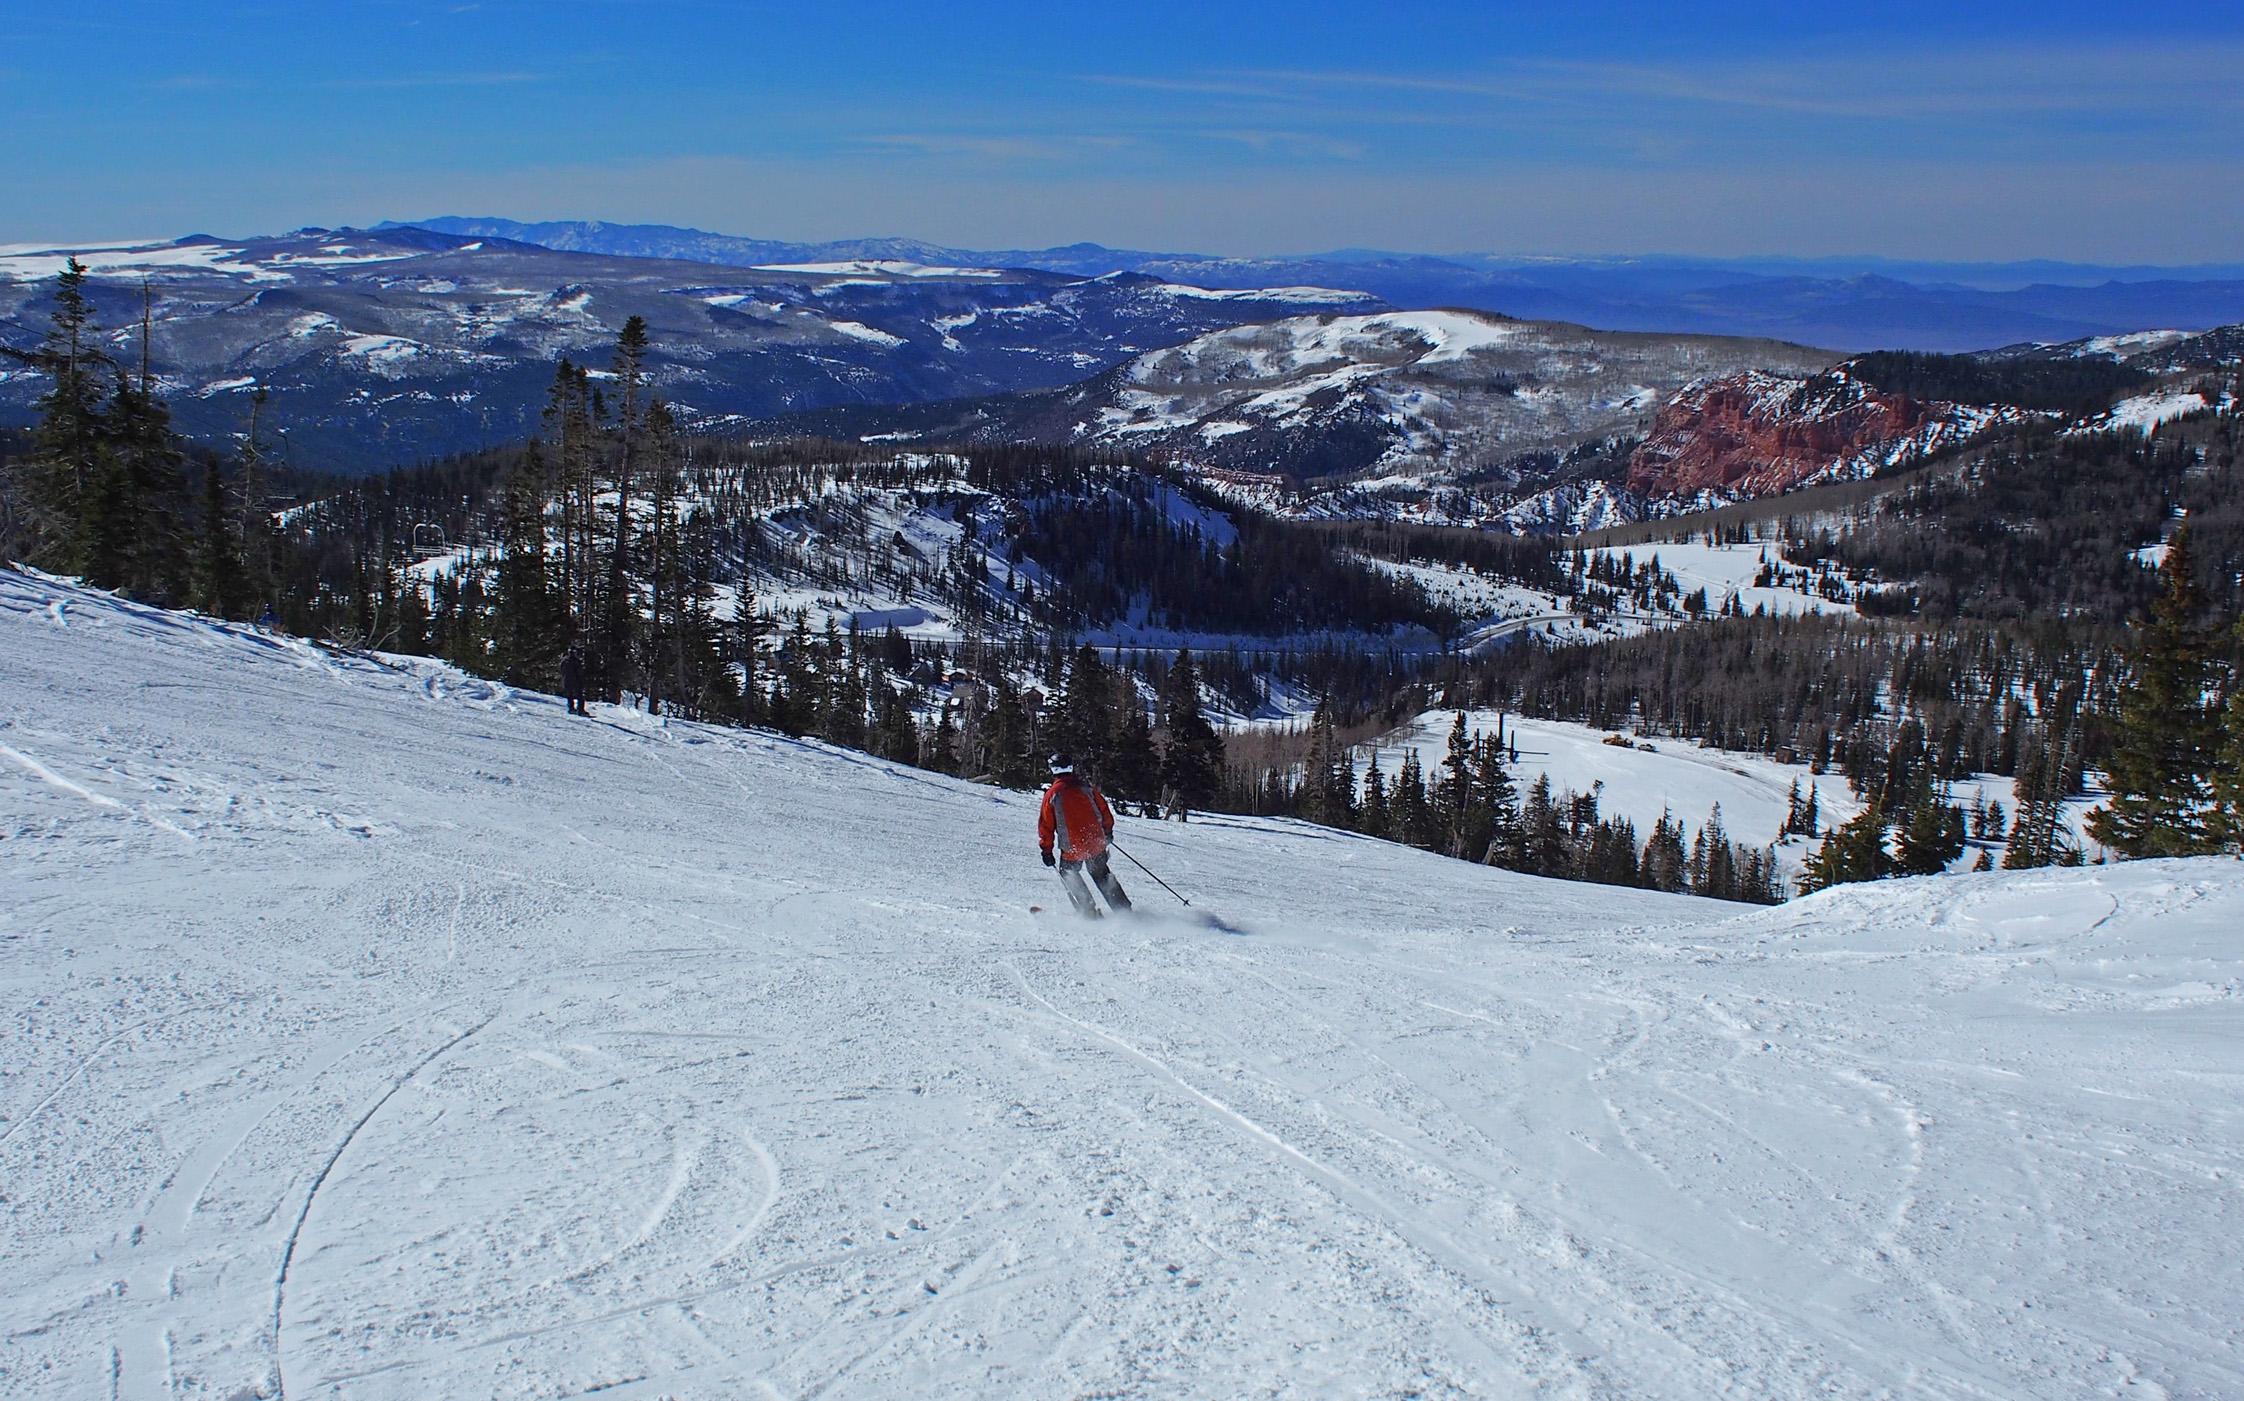 brian head…that other utah ski resort – west-centric